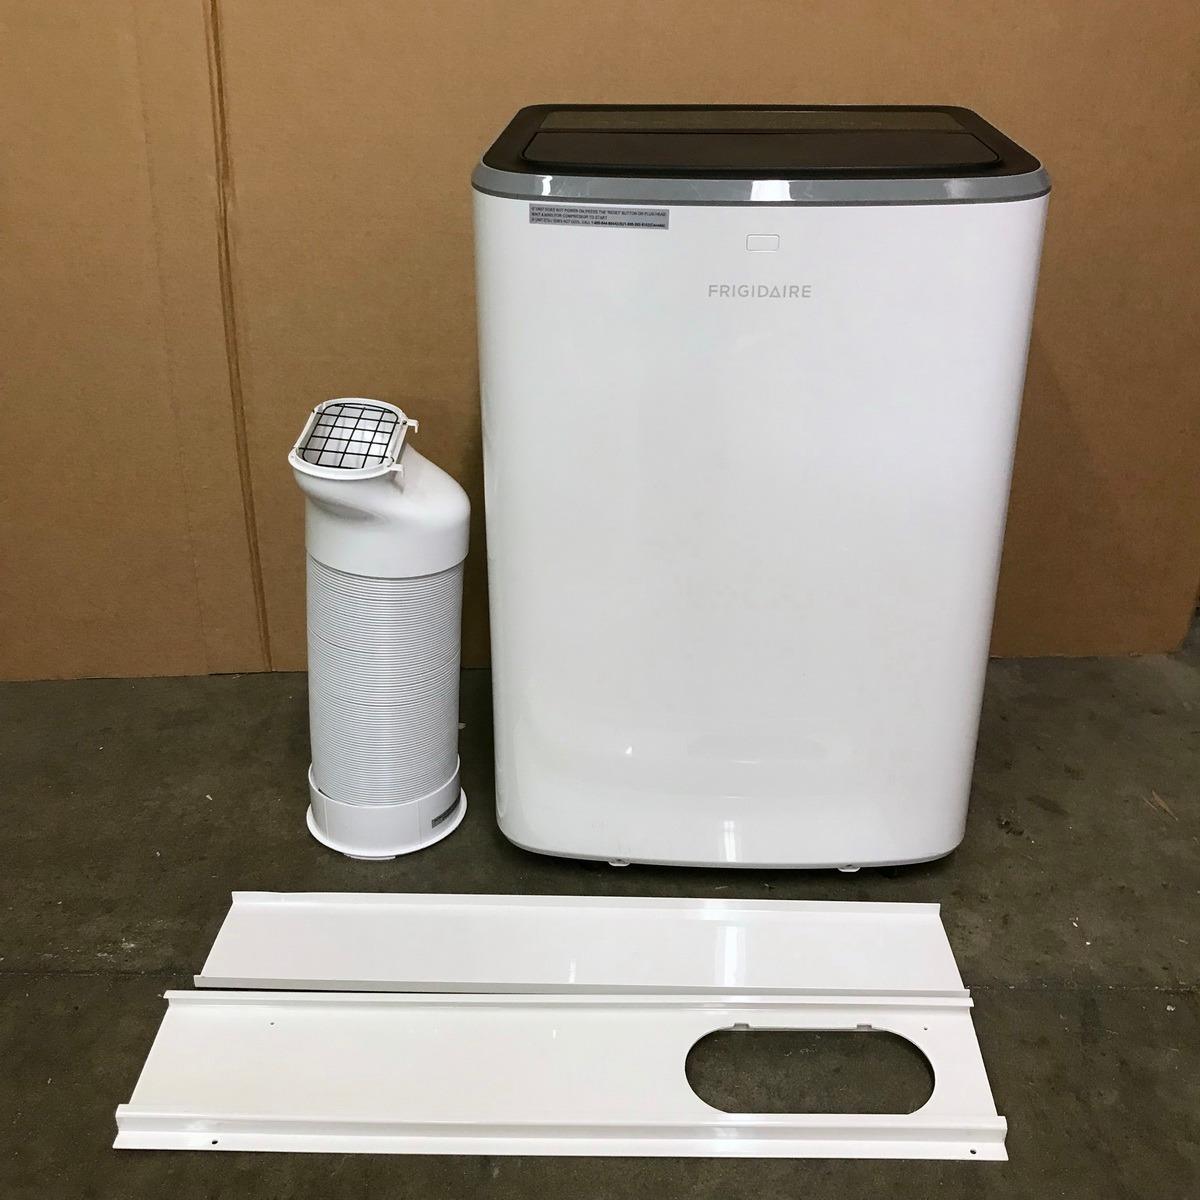 Details about Frigidaire 8,000 BTU Portable Air Conditioner Hose & window  kit FFPA0822U1 F/S